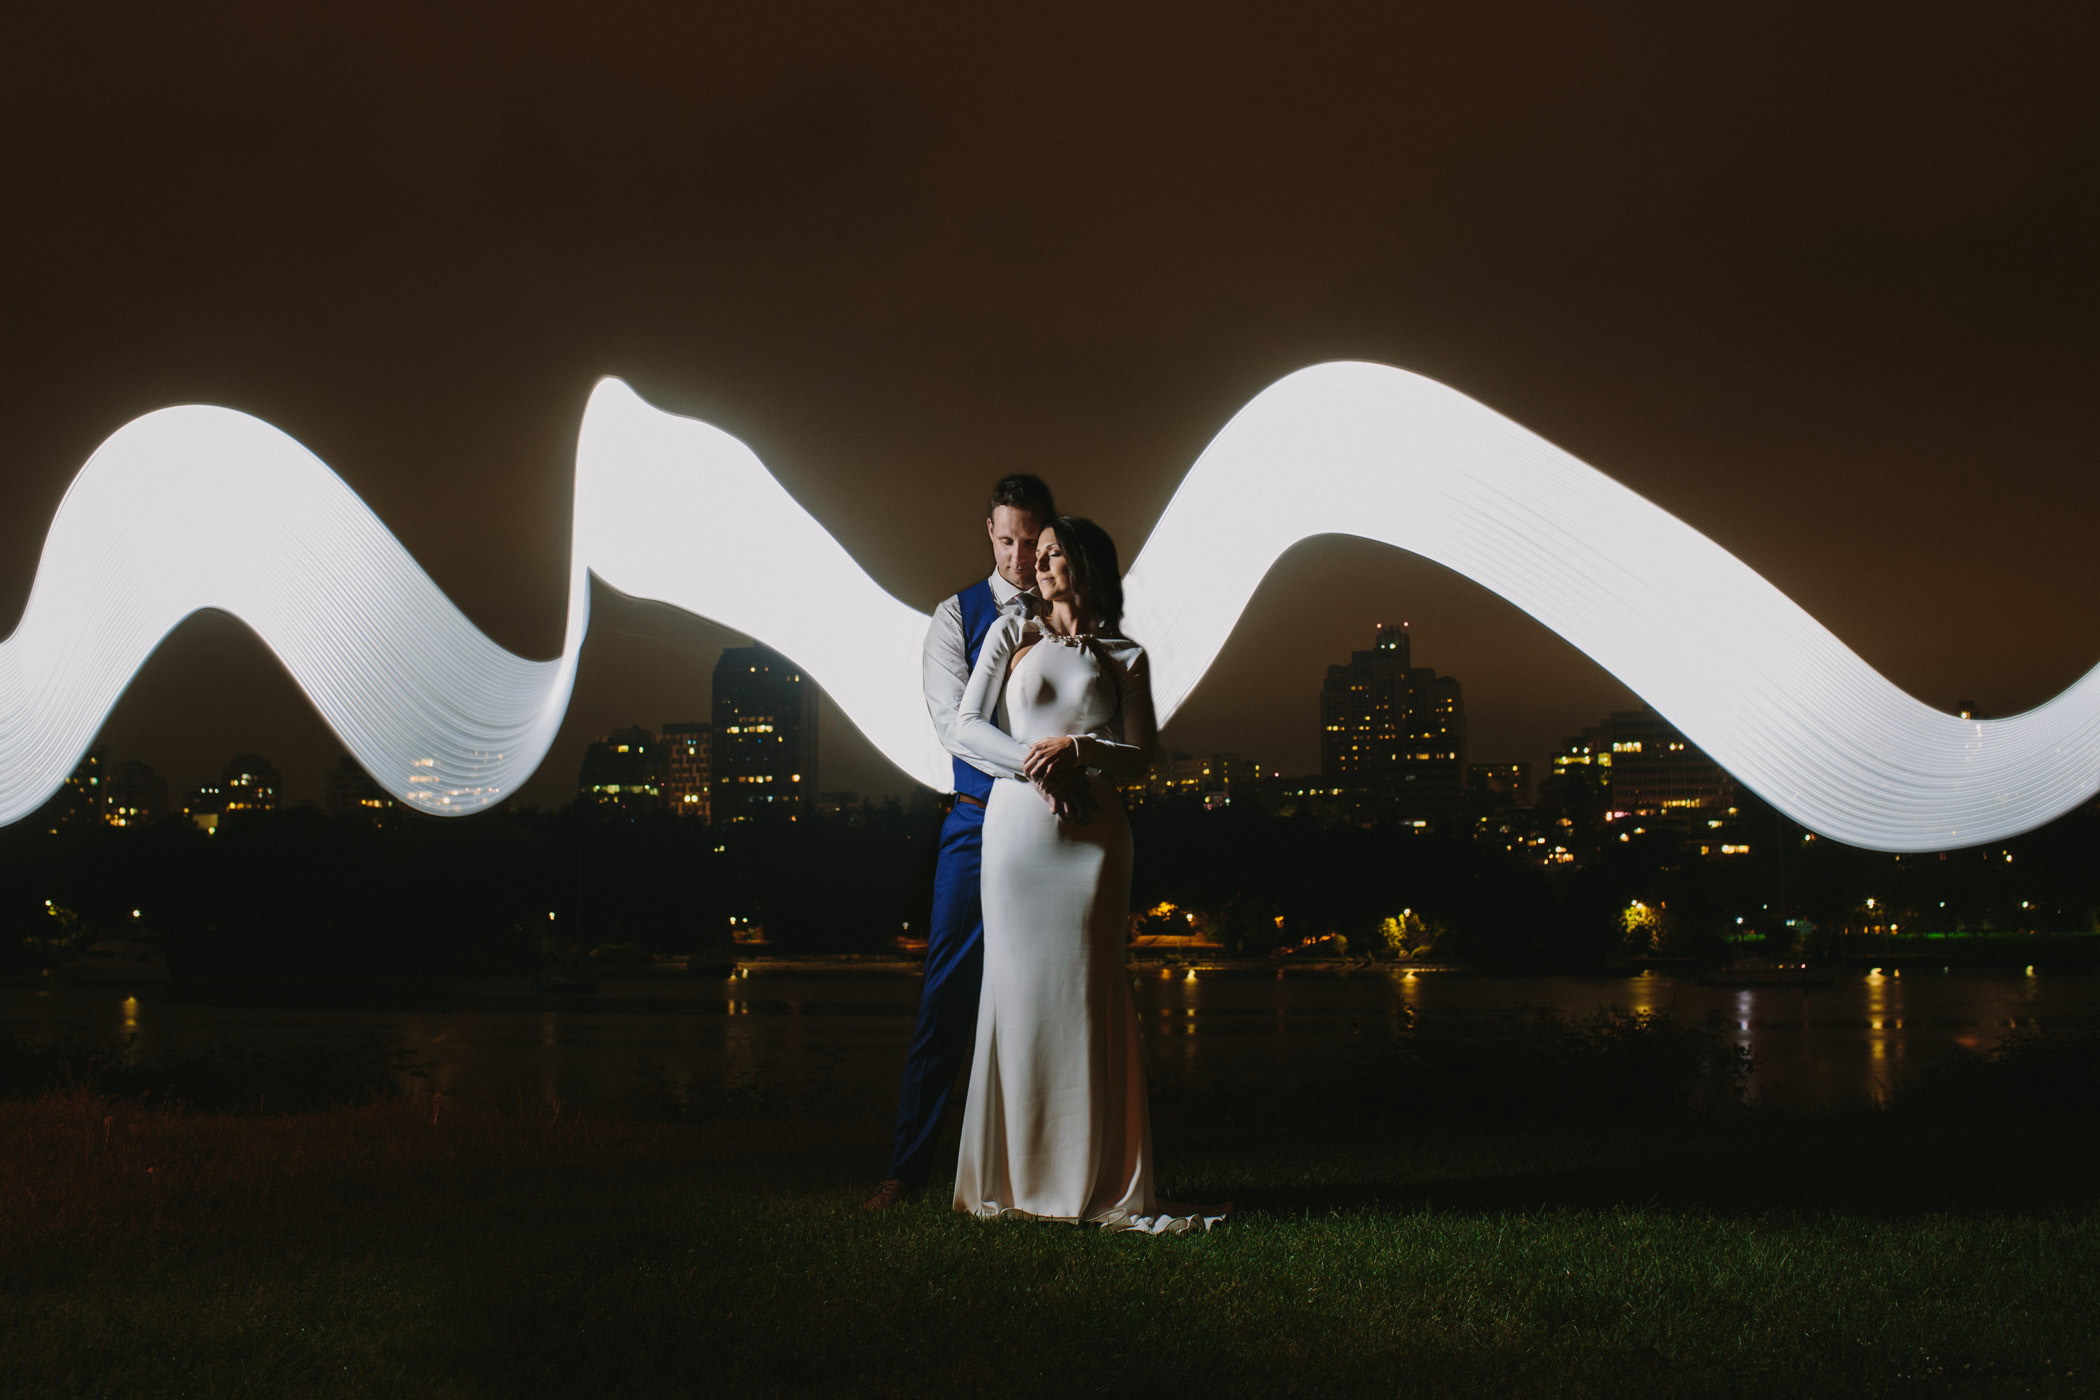 David Lam Park Night Portrait